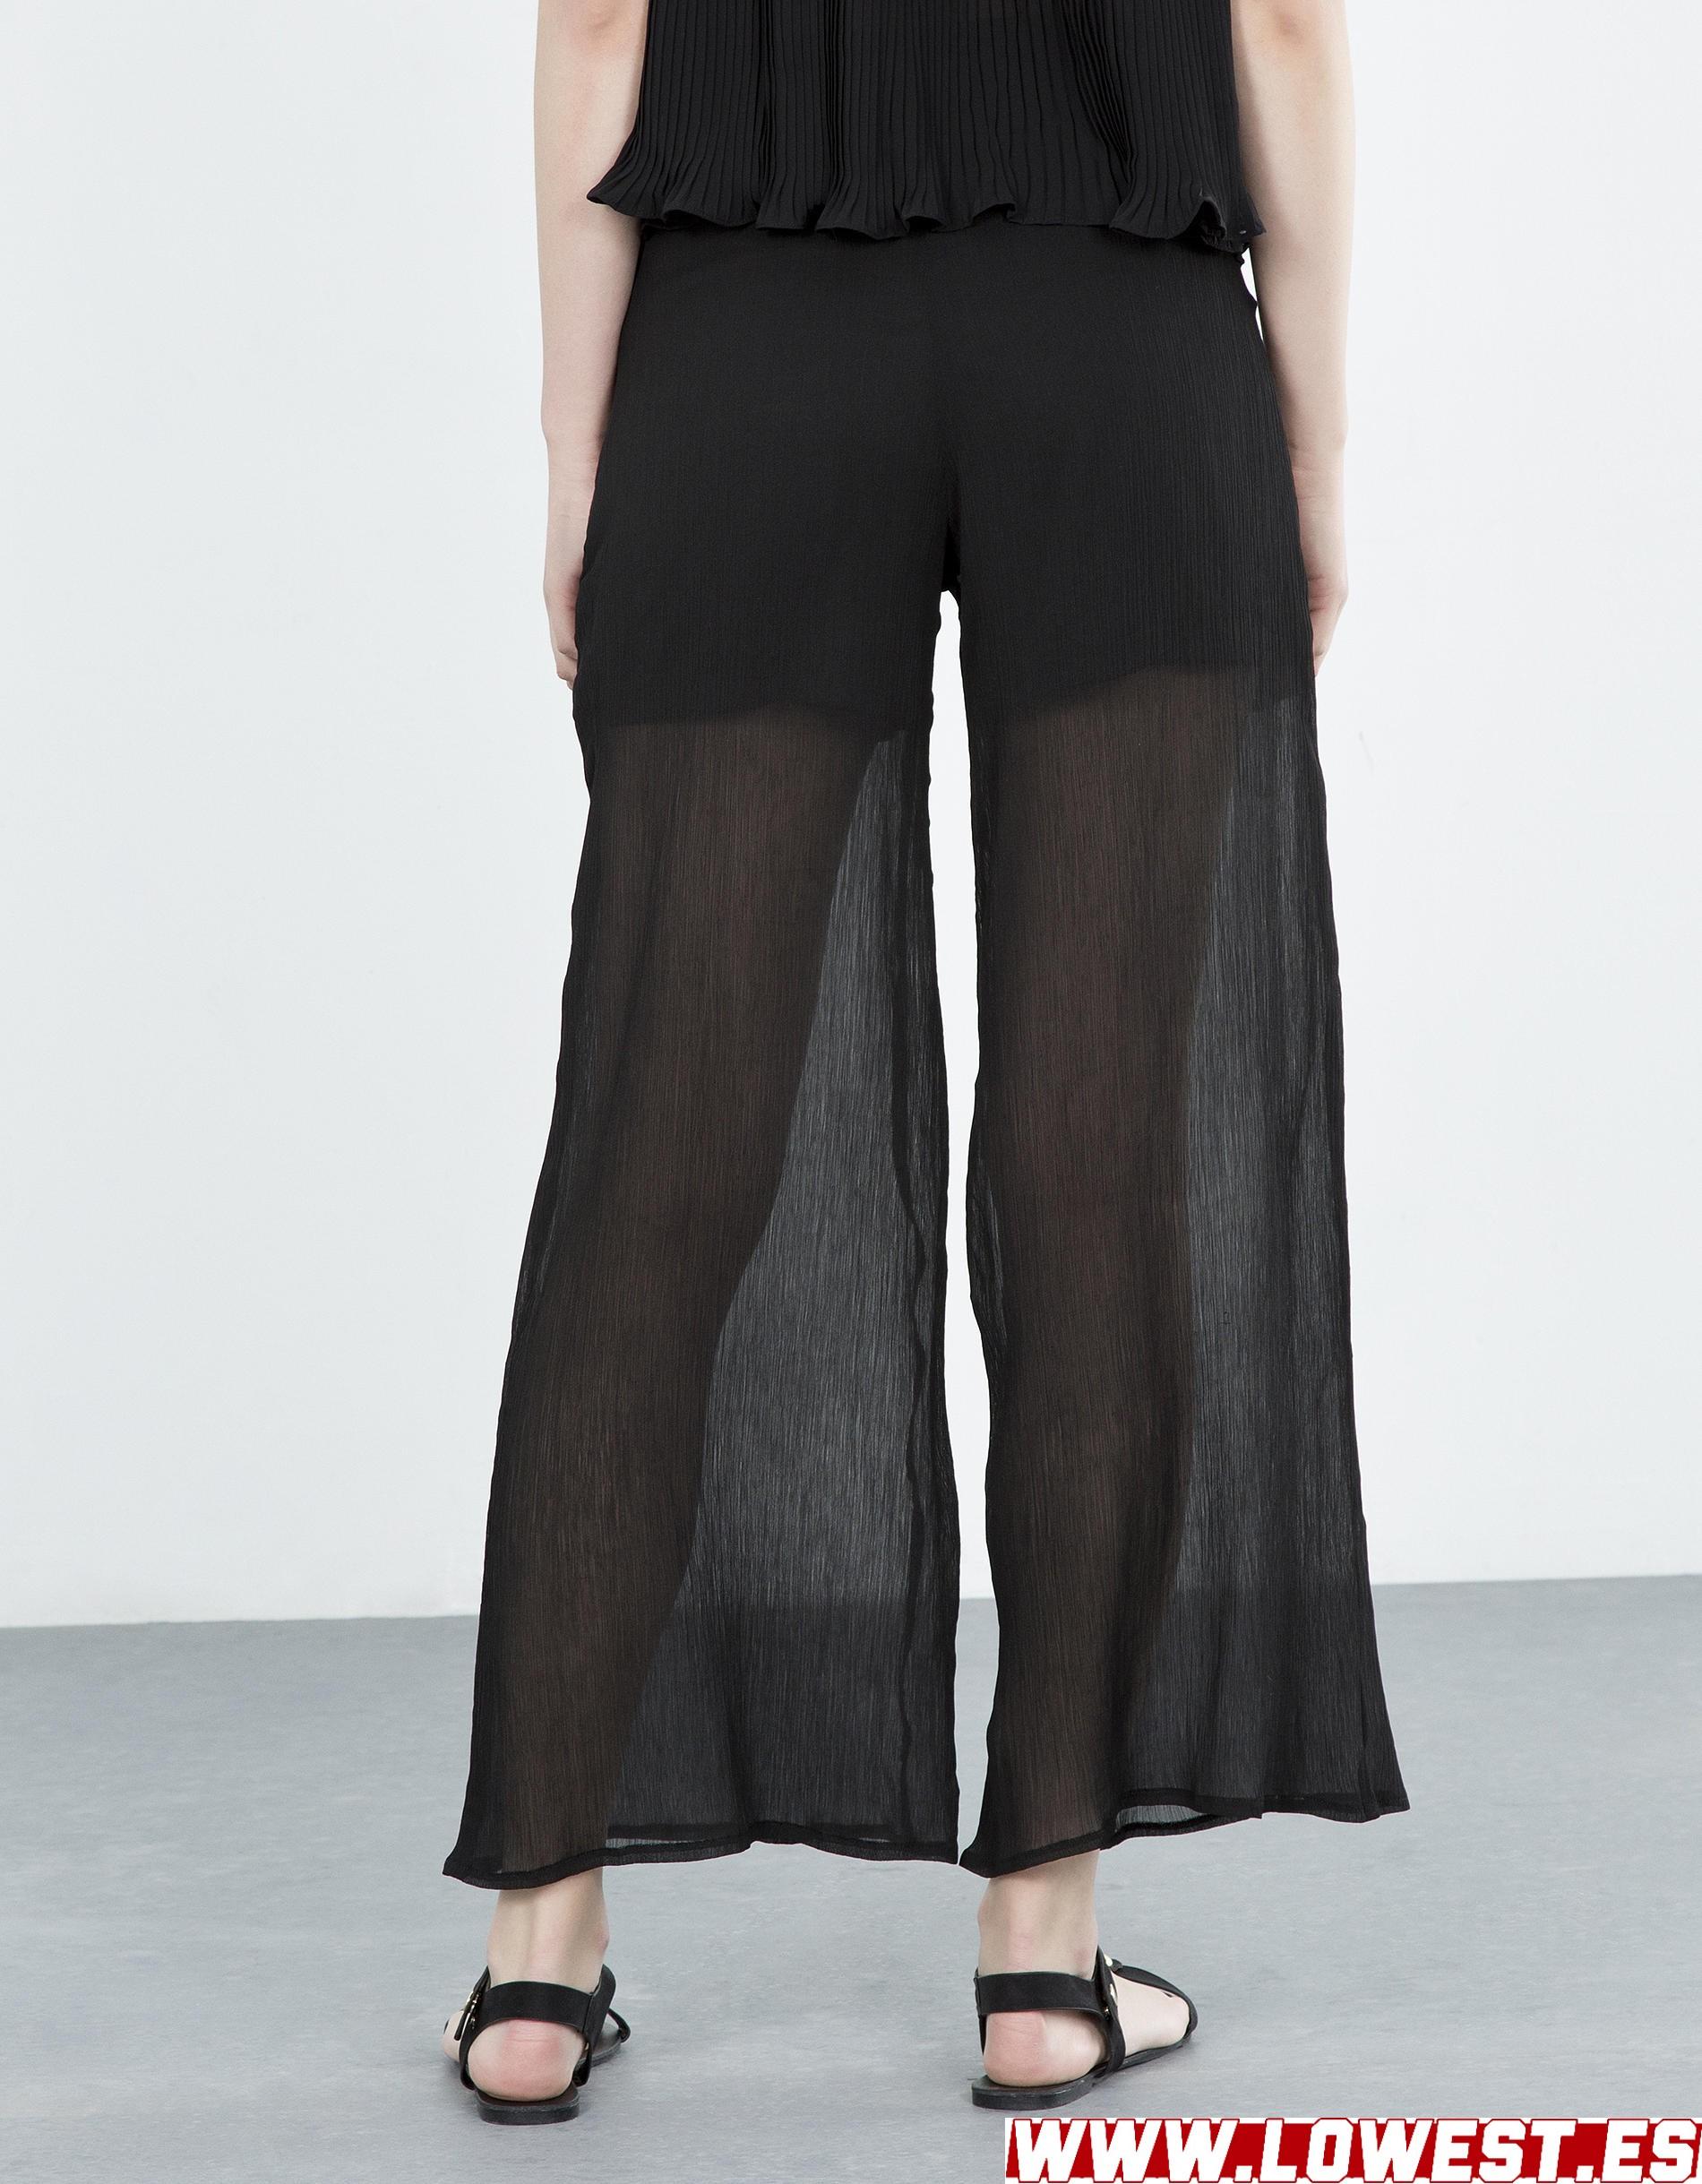 ropa invierno mujer pantalones campana Lowest 2019 2020